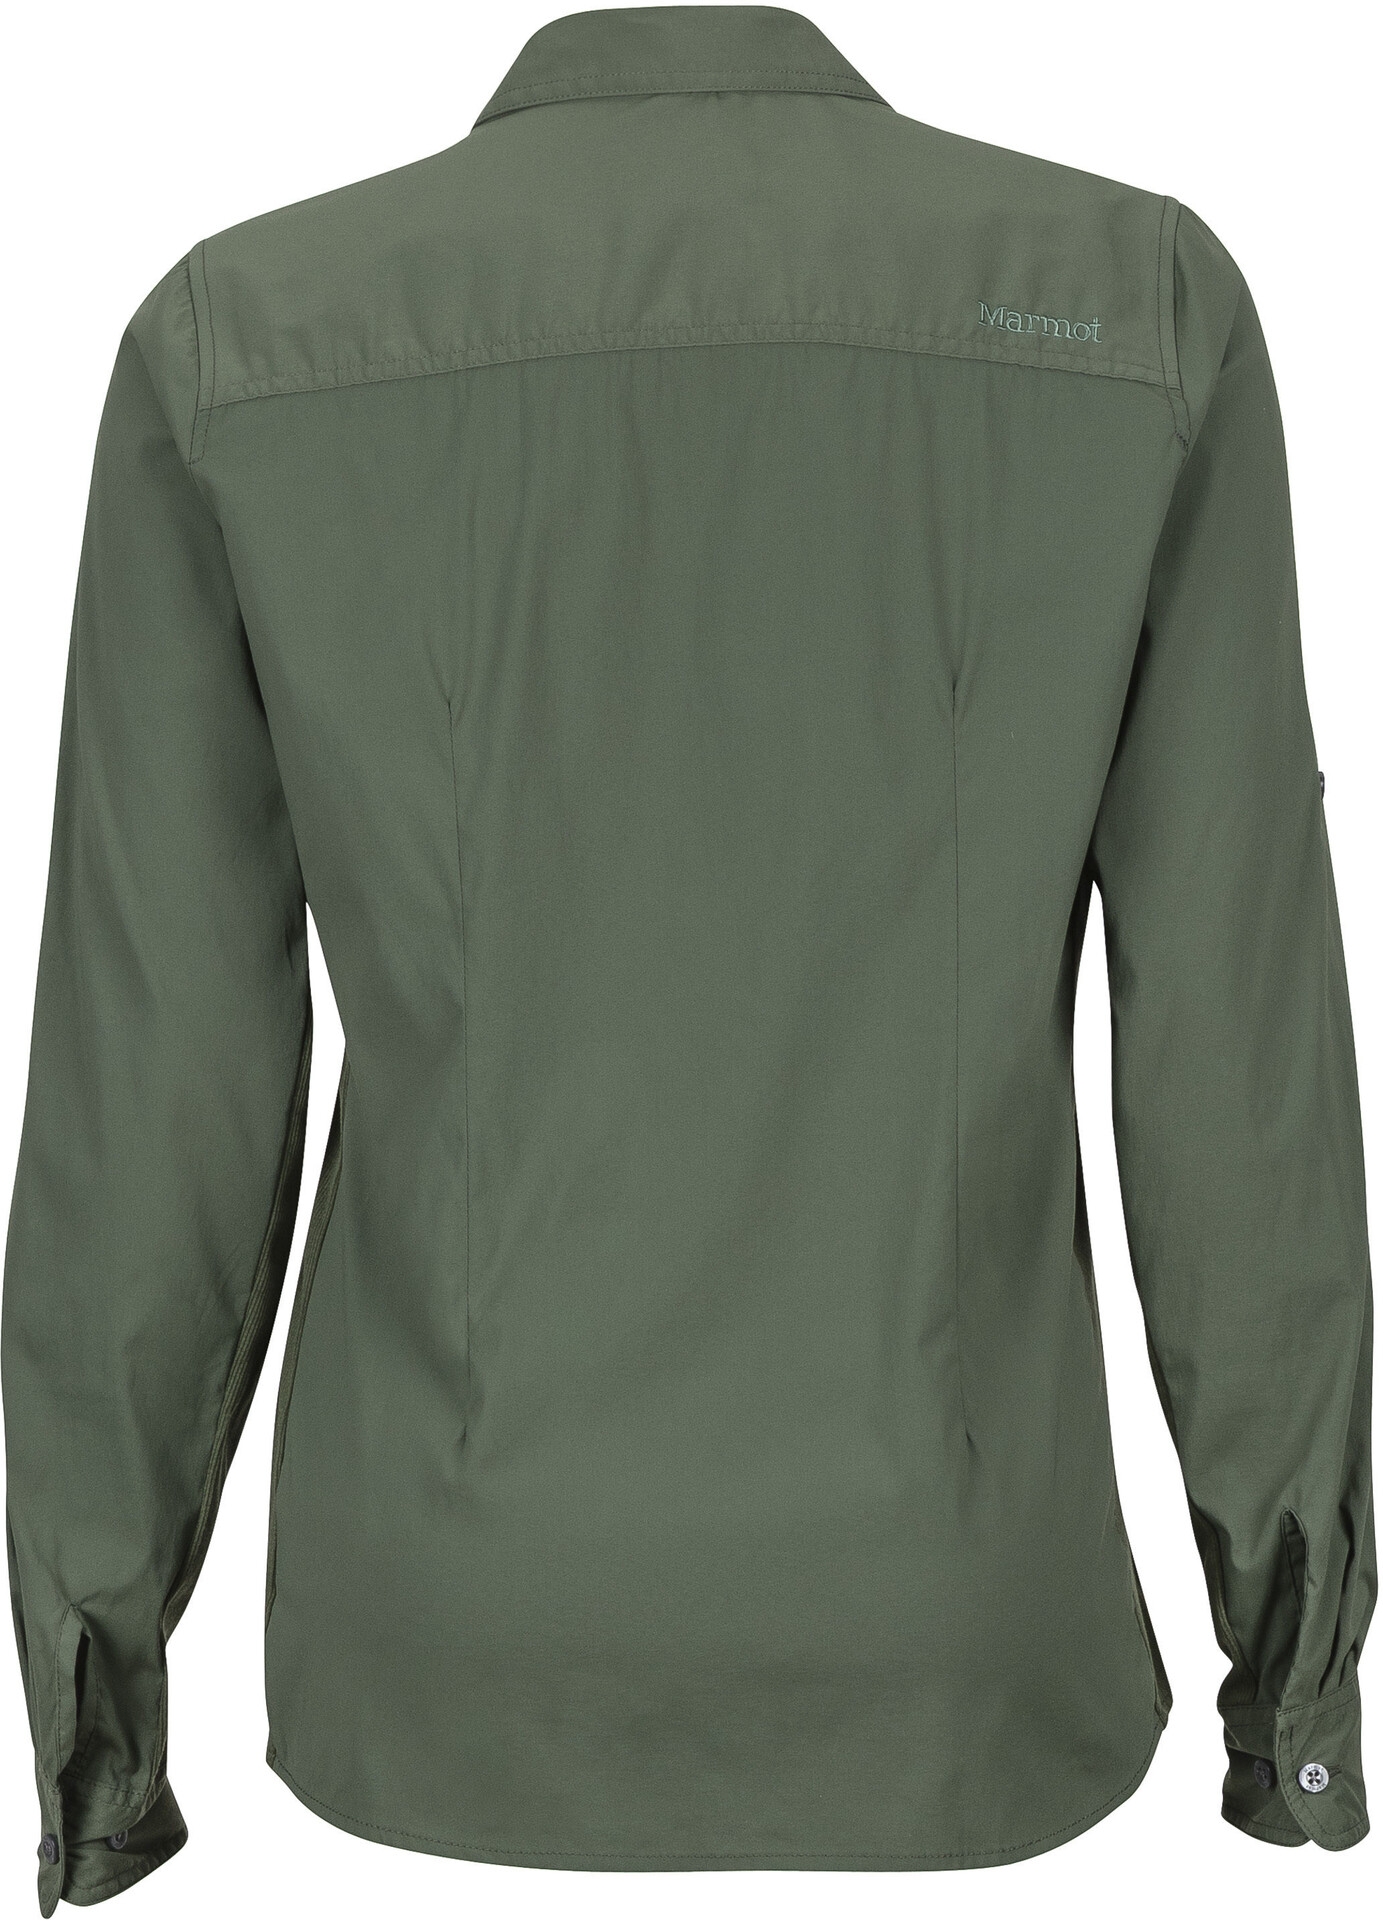 Marmot Wm's Annika LS (Dark Steel) Long Sleeve Outdoor Shirt